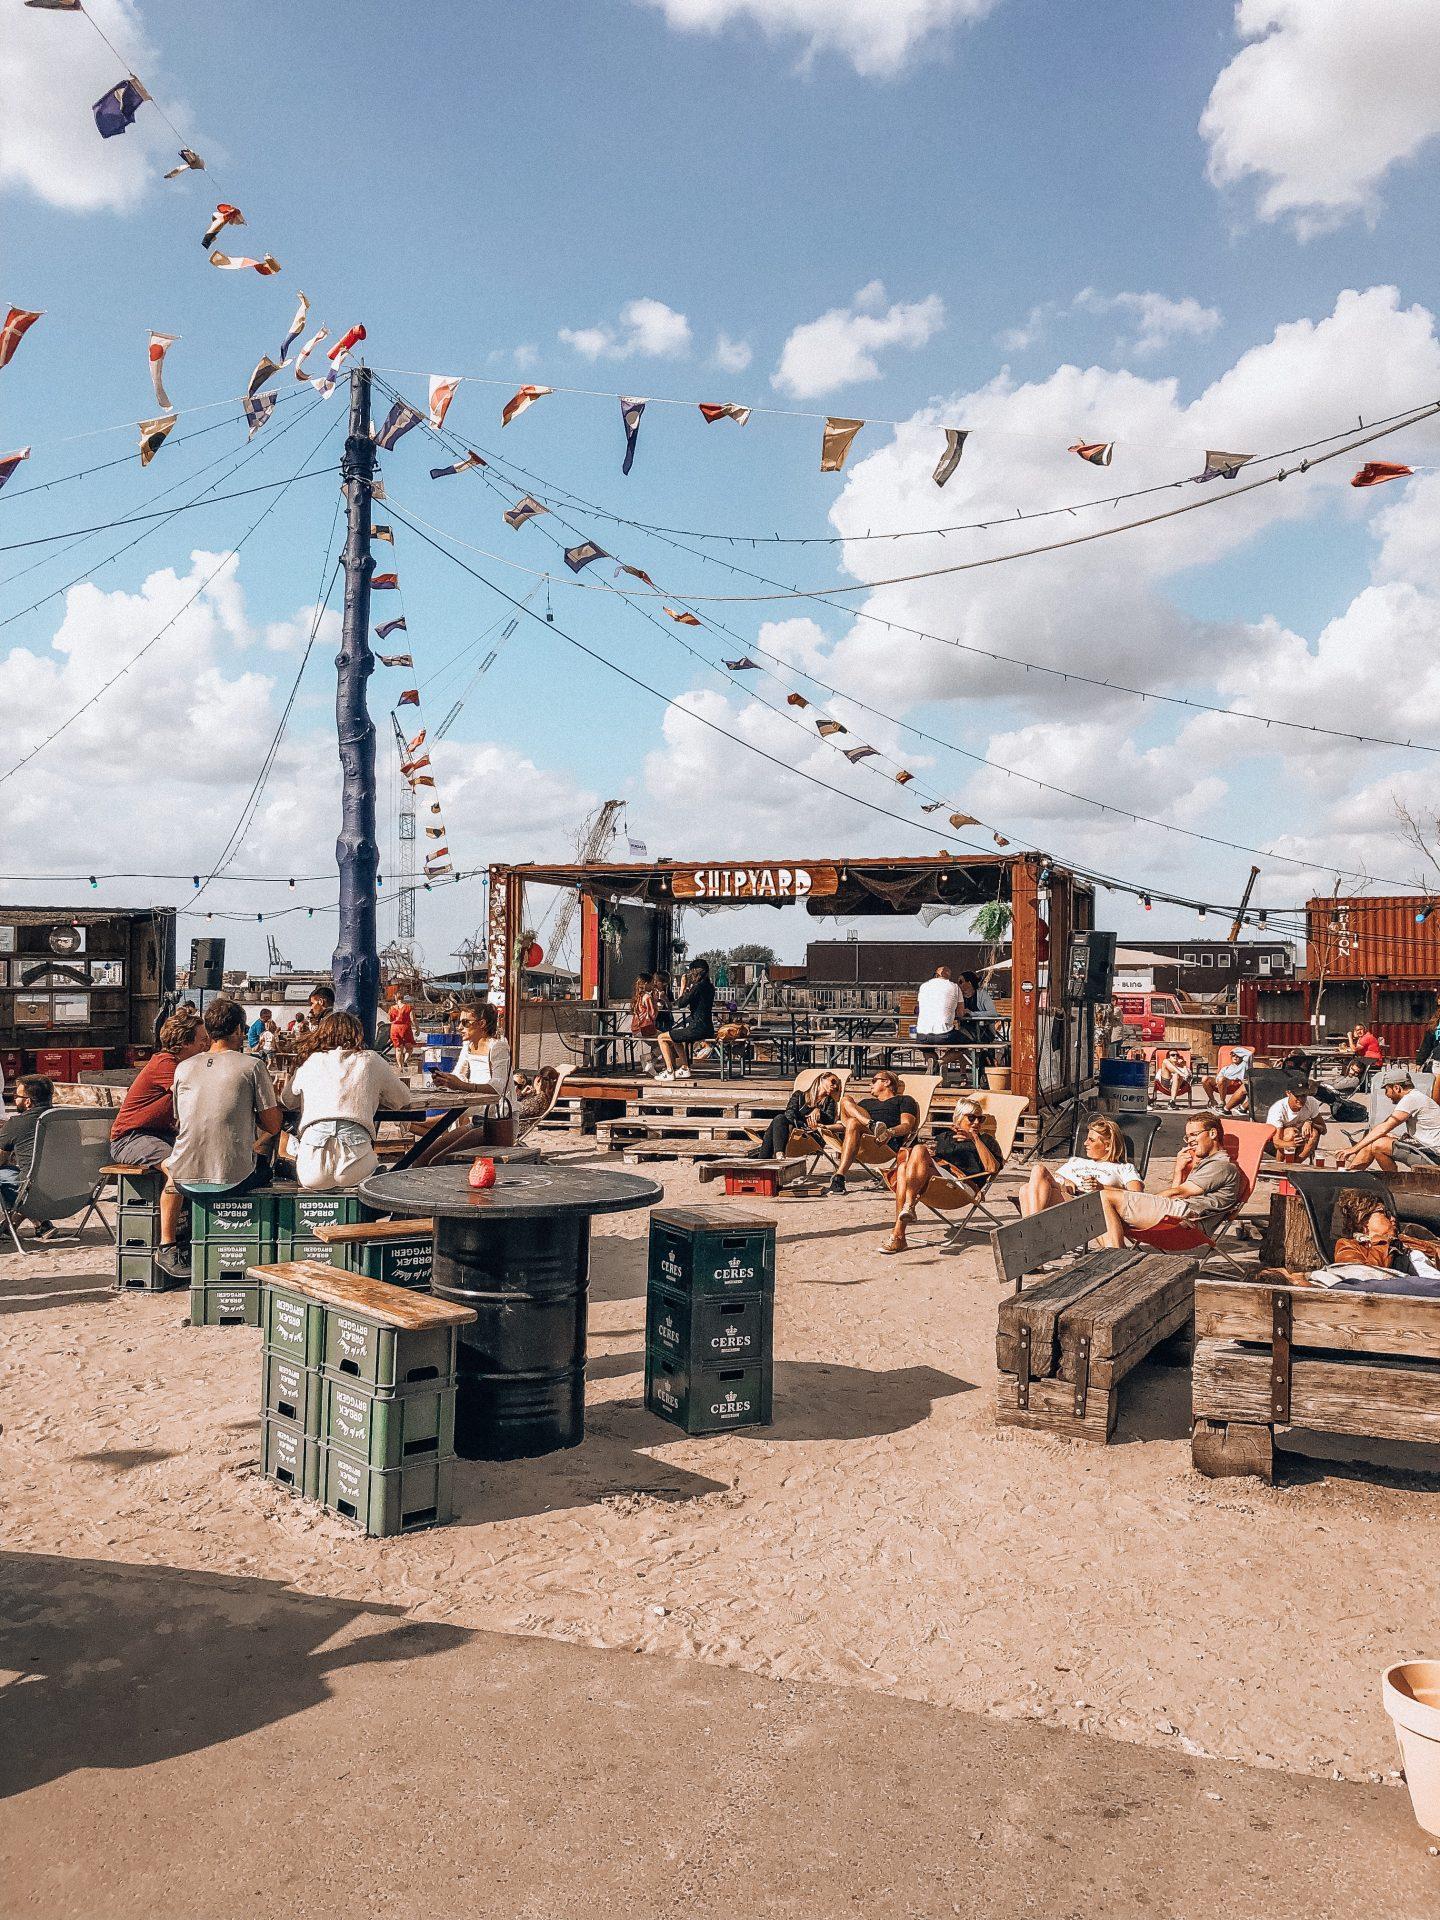 Copenhague, le temple de la street food !